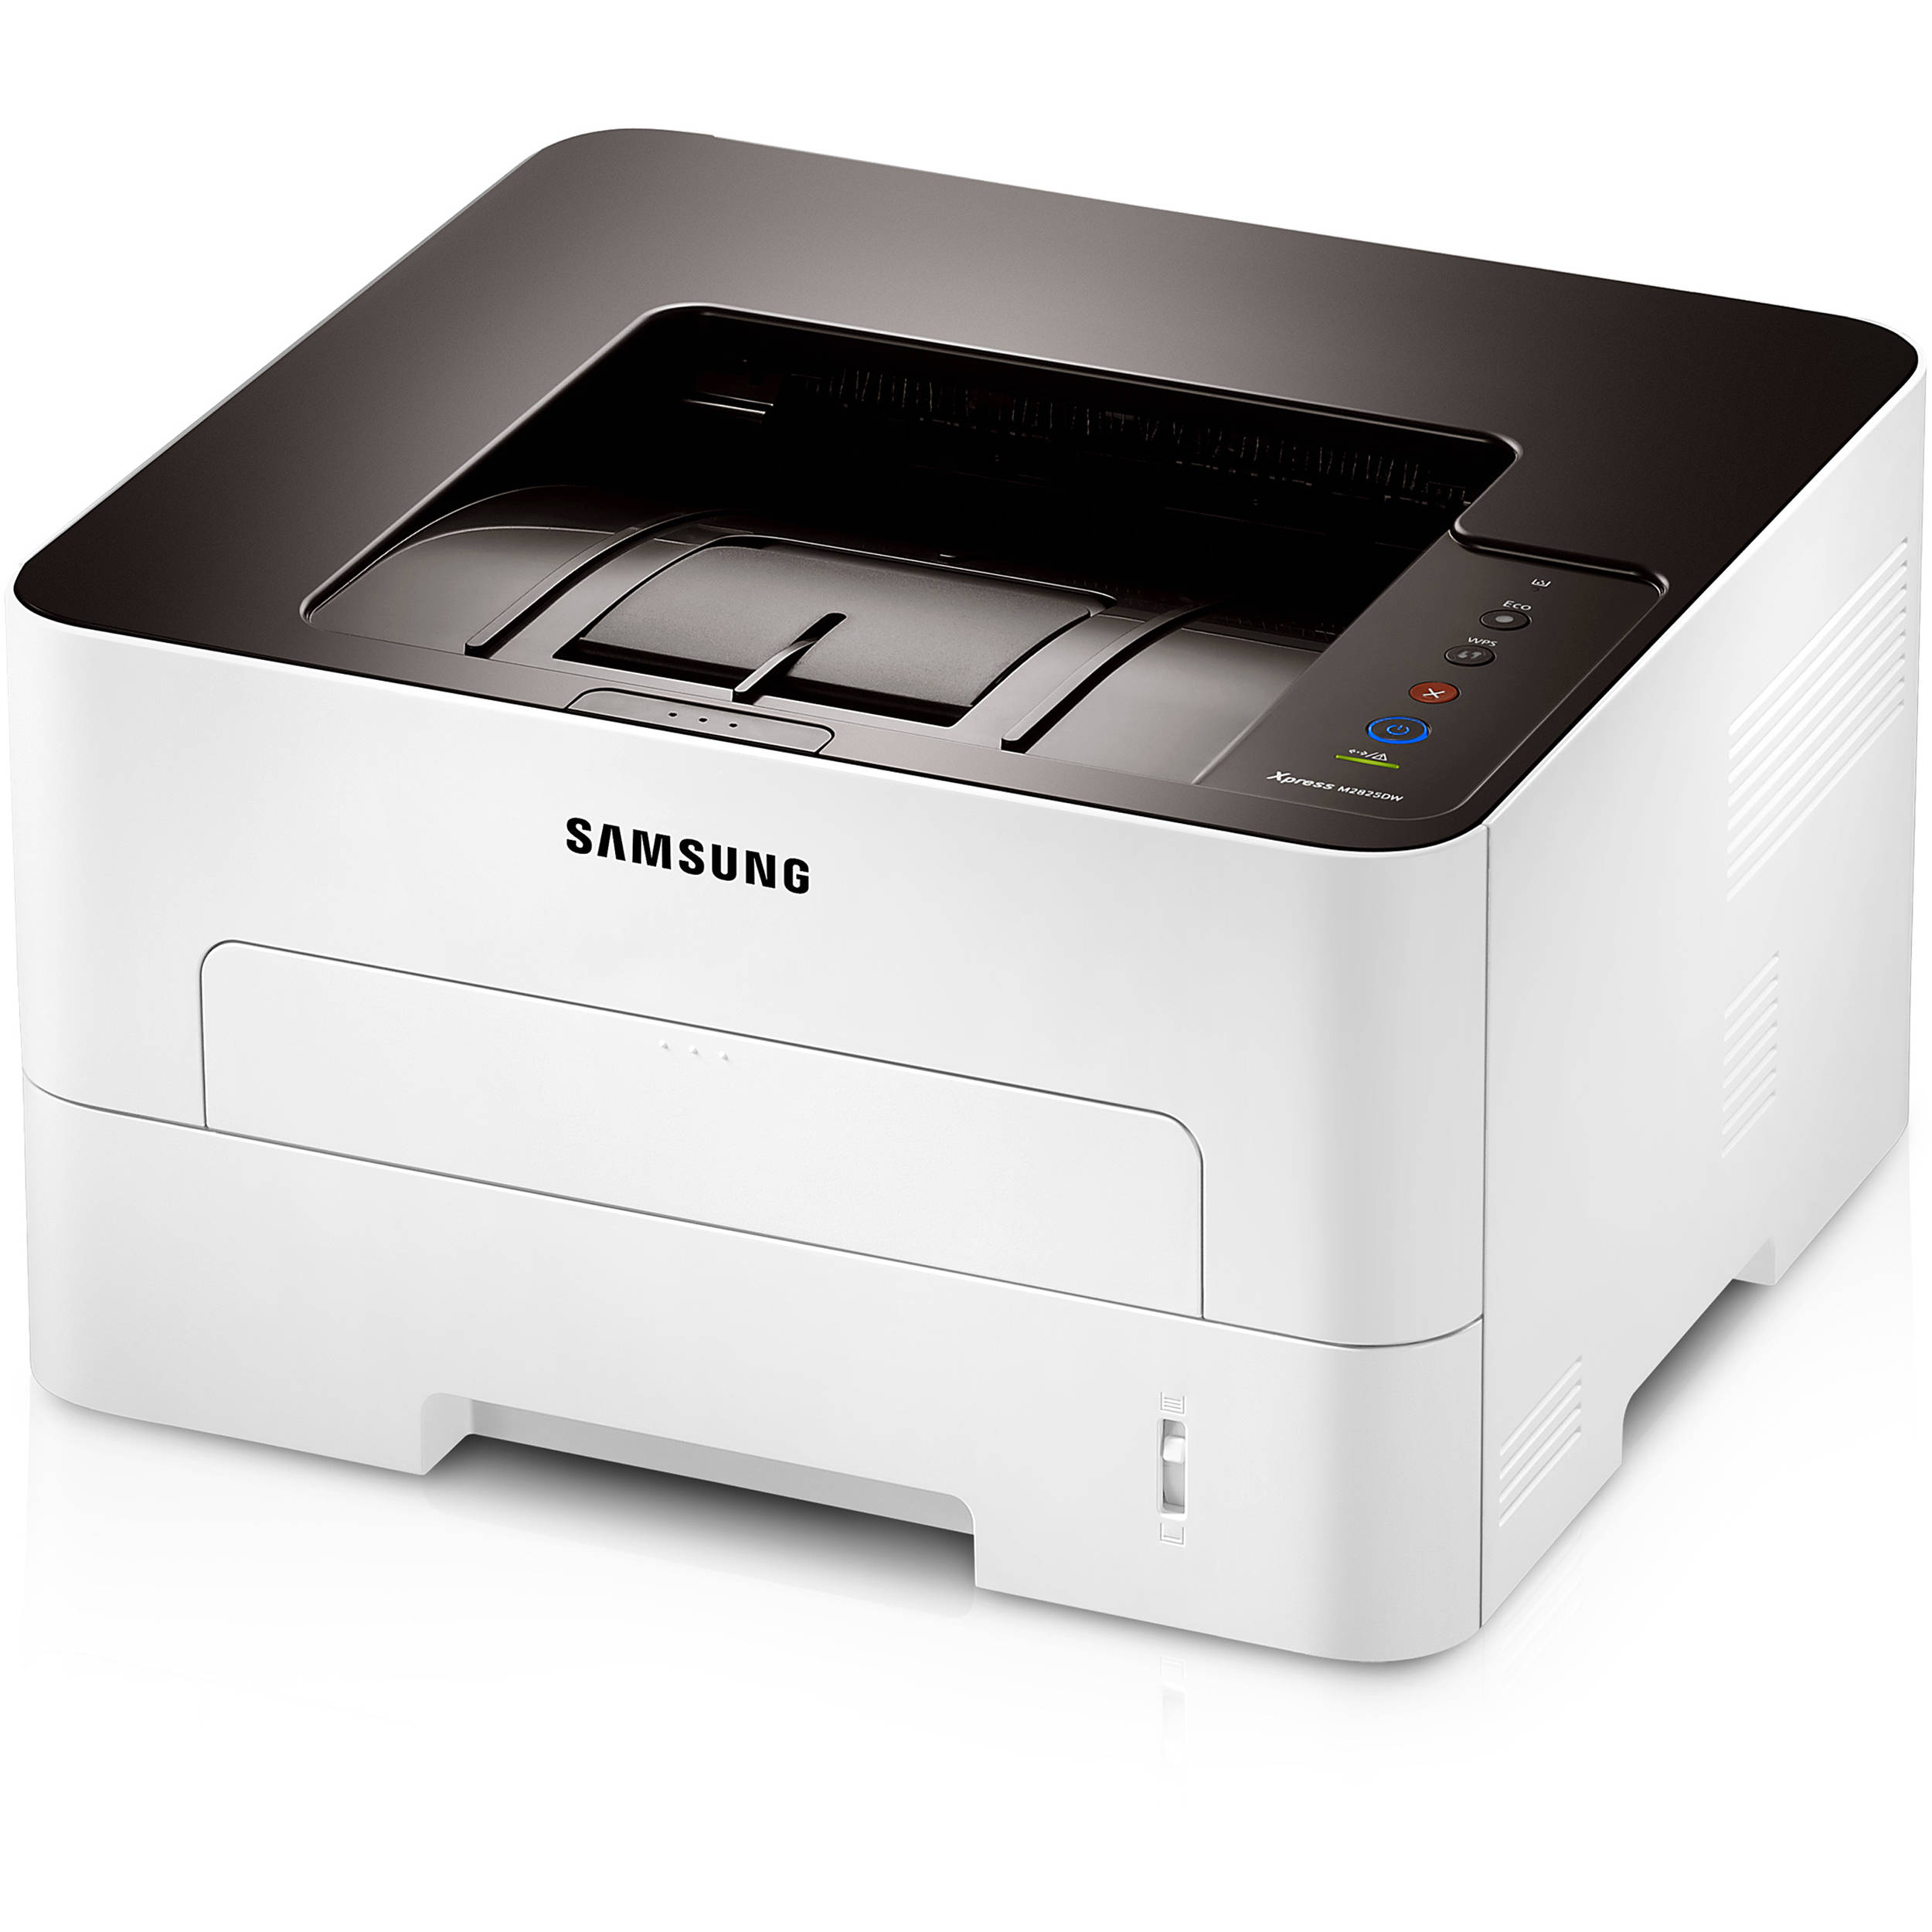 Samsung Xpress SL-M2825DW Printer (Add Printer) Drivers Windows 7